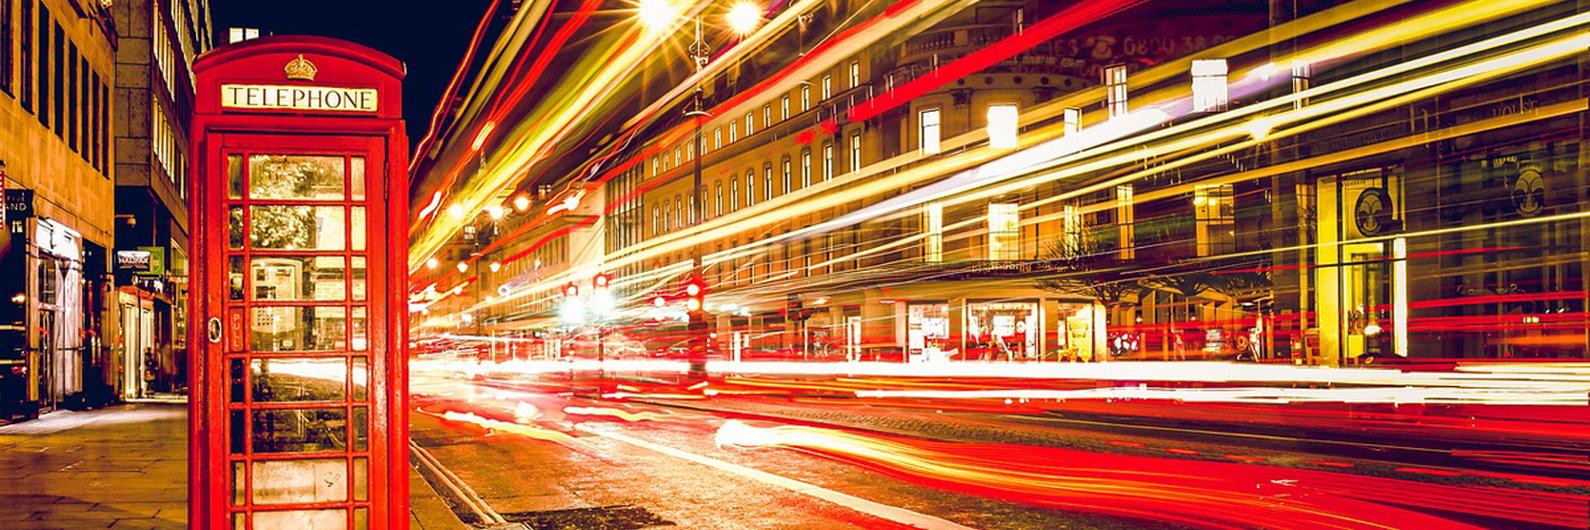 Deslumbre-se com a vibrante capital inglesa